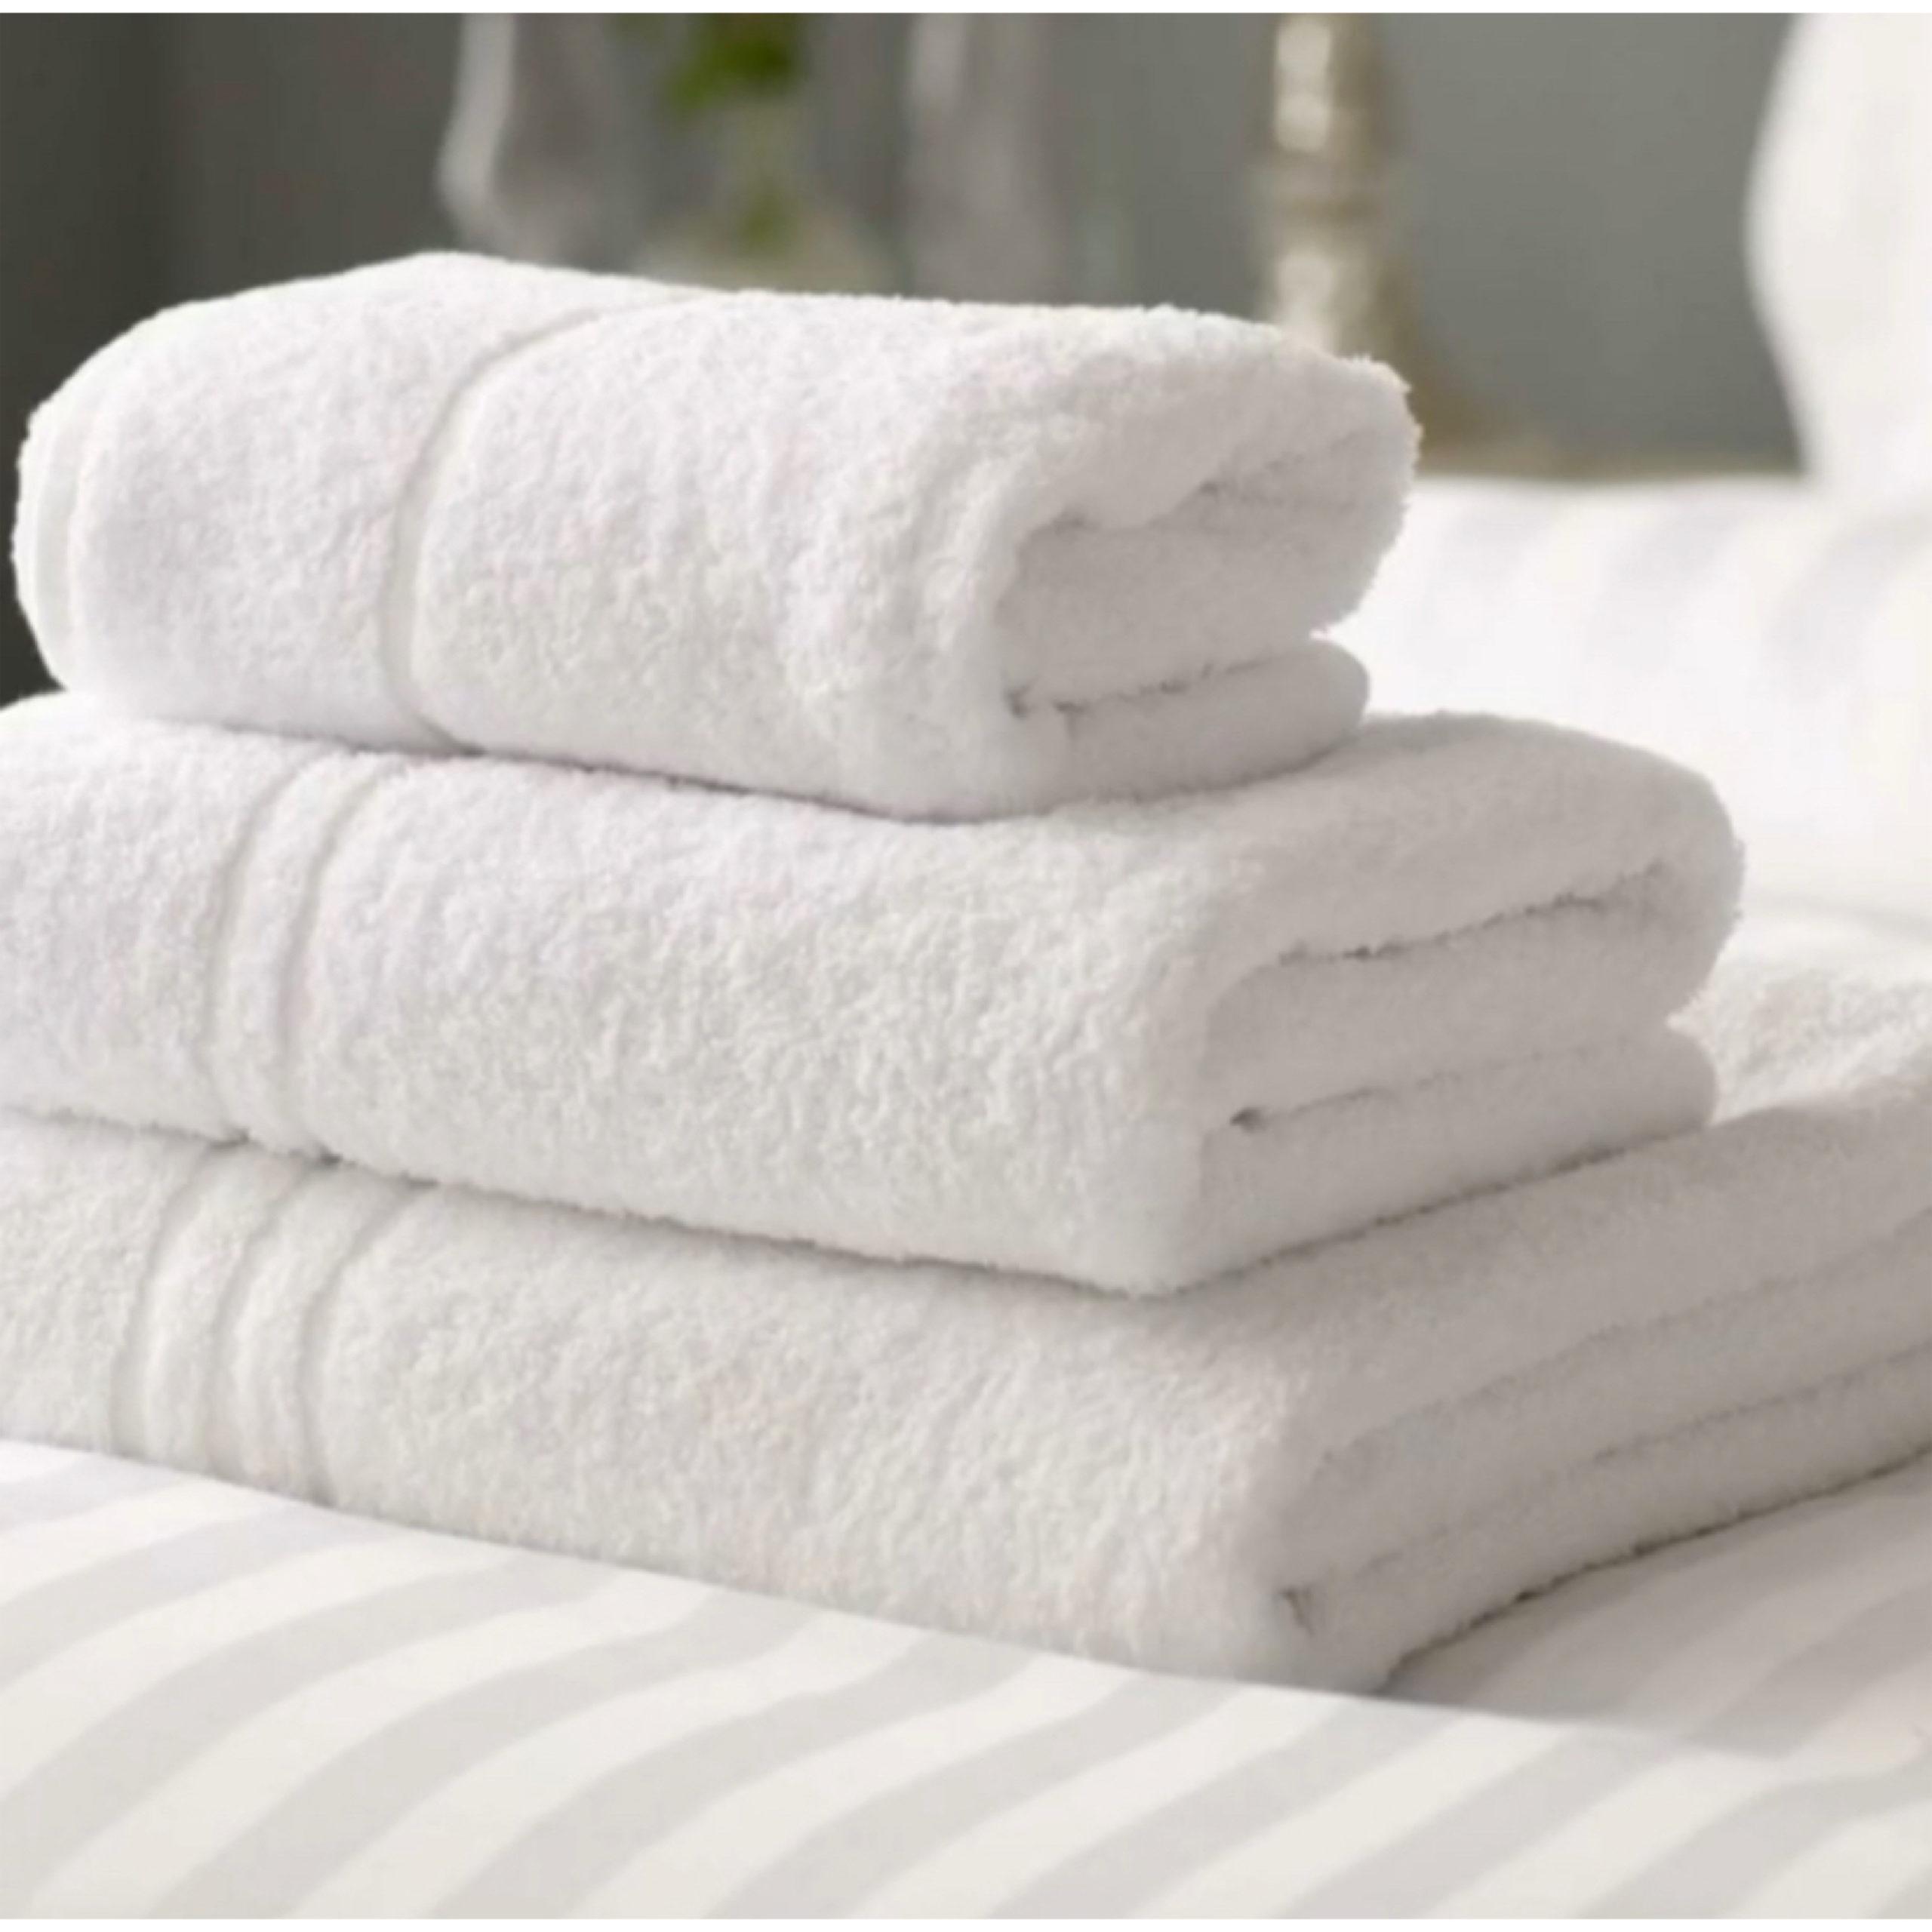 Bed- Bad- en Keukenlinnen Wassen